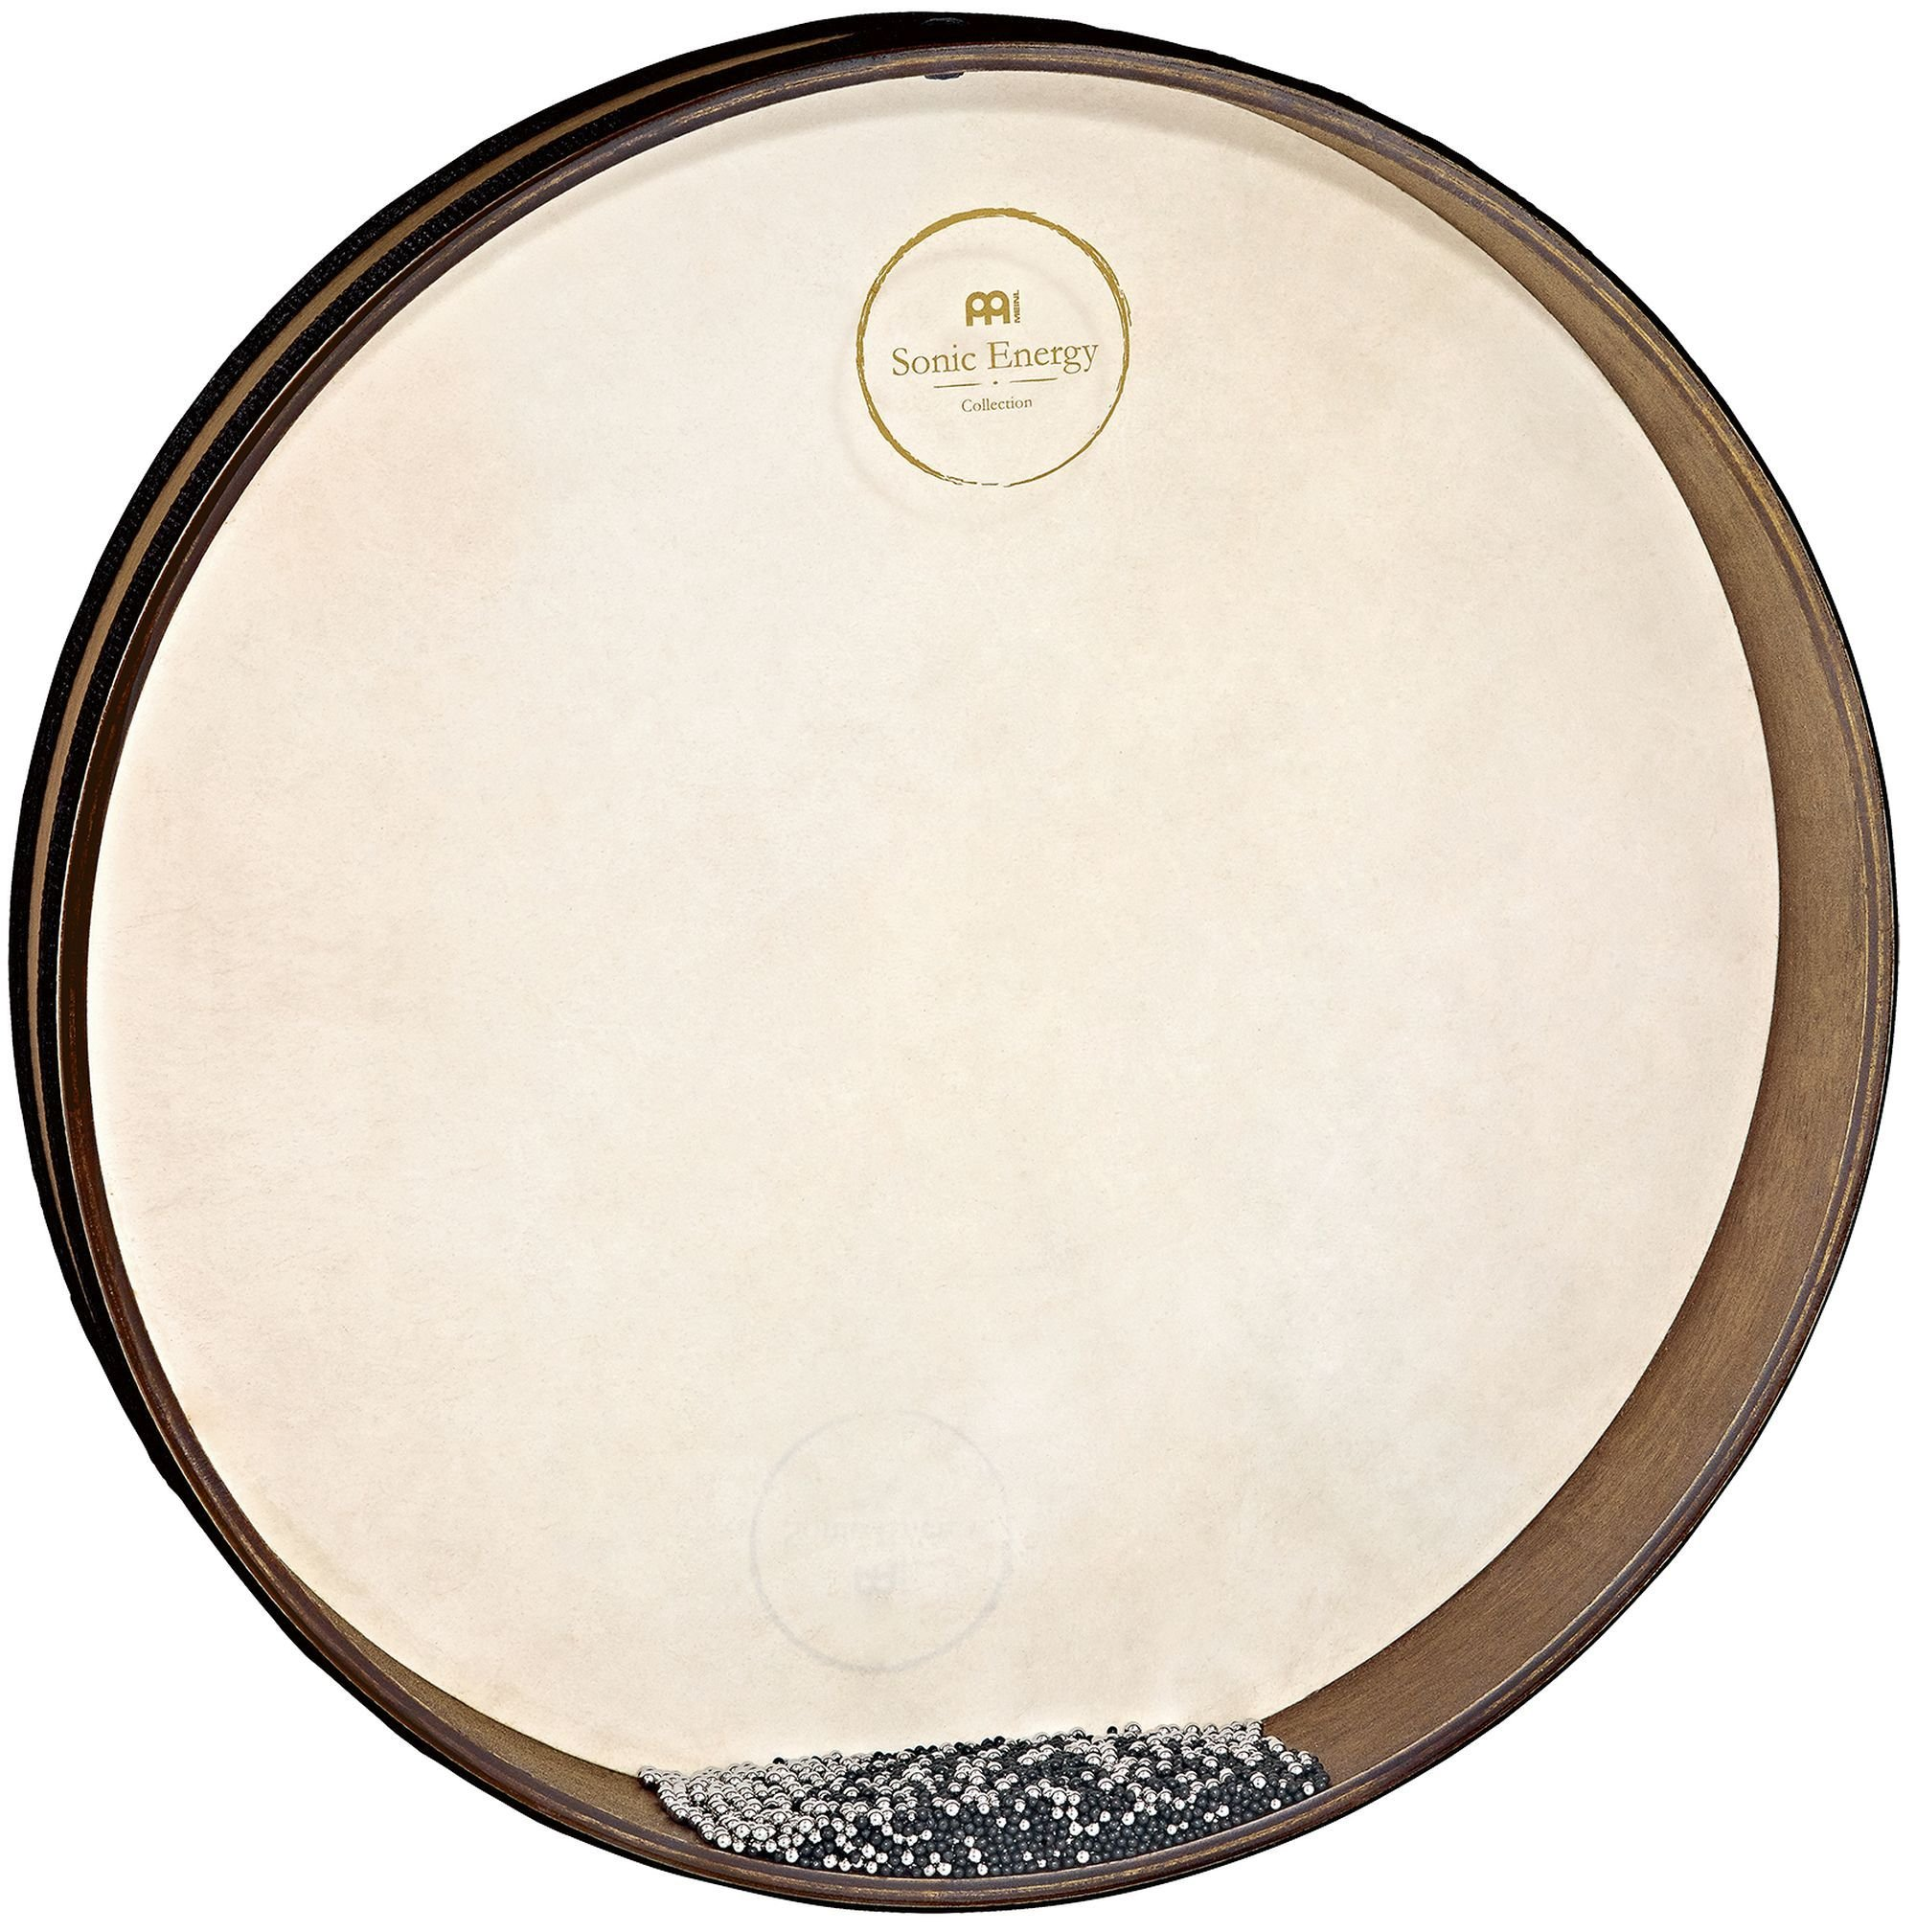 Meinl Sonic Energy WD16WB 16-Inch Wave Drum, Walnut Brown by Meinl Sonic Energy